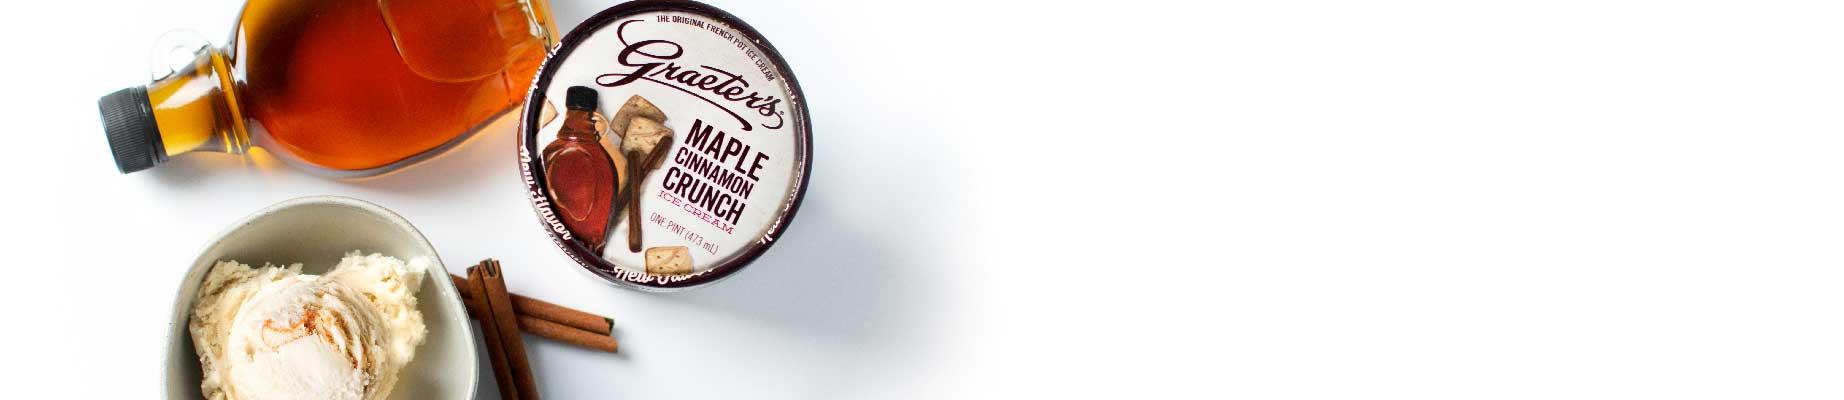 Graeter's New Flavor, Maple Cinnamon Crunch